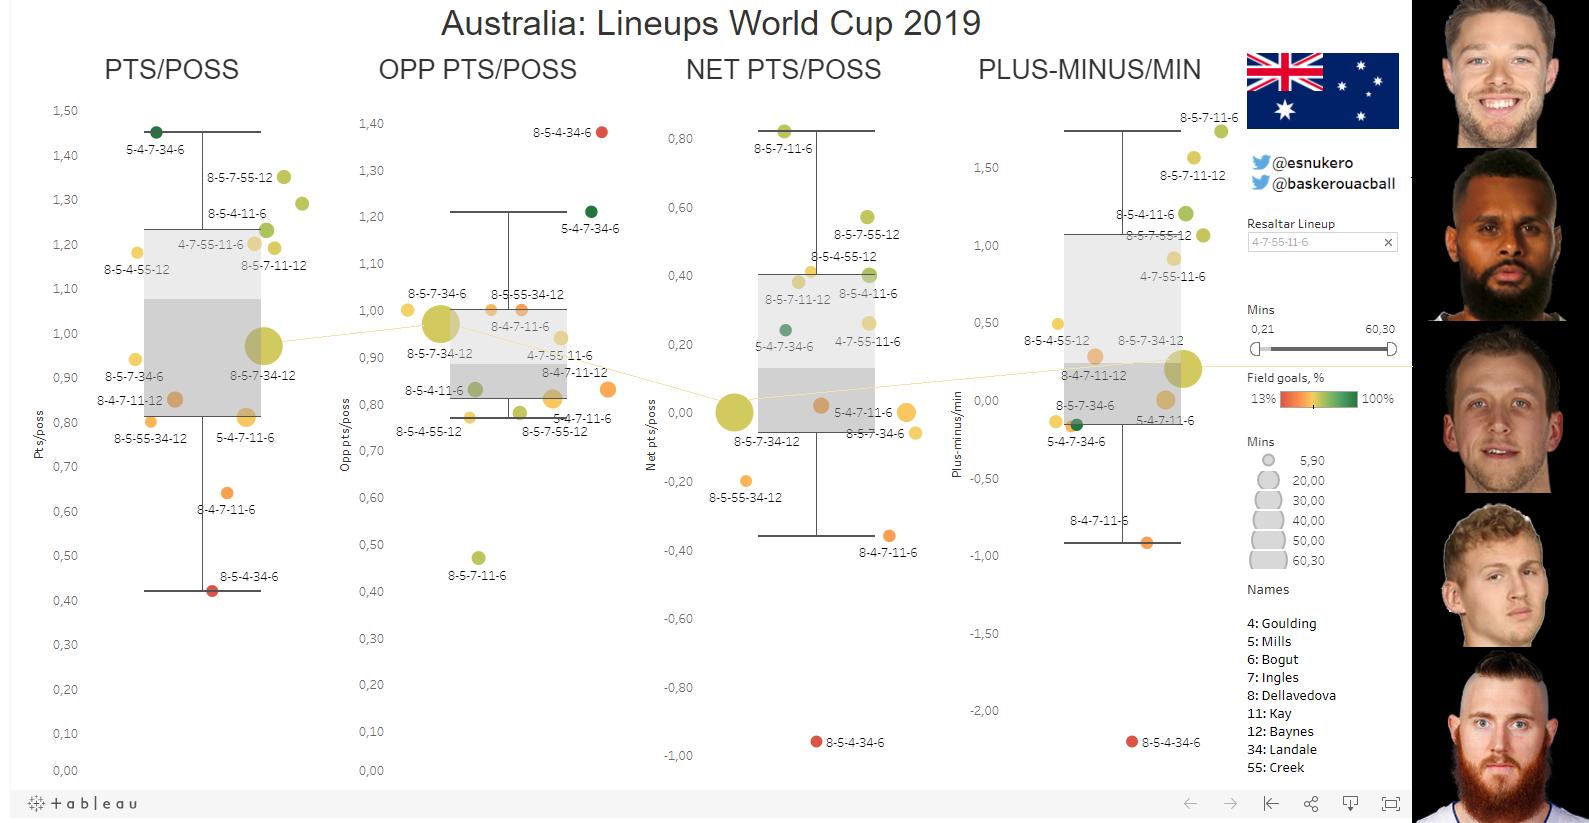 australia most used lineup